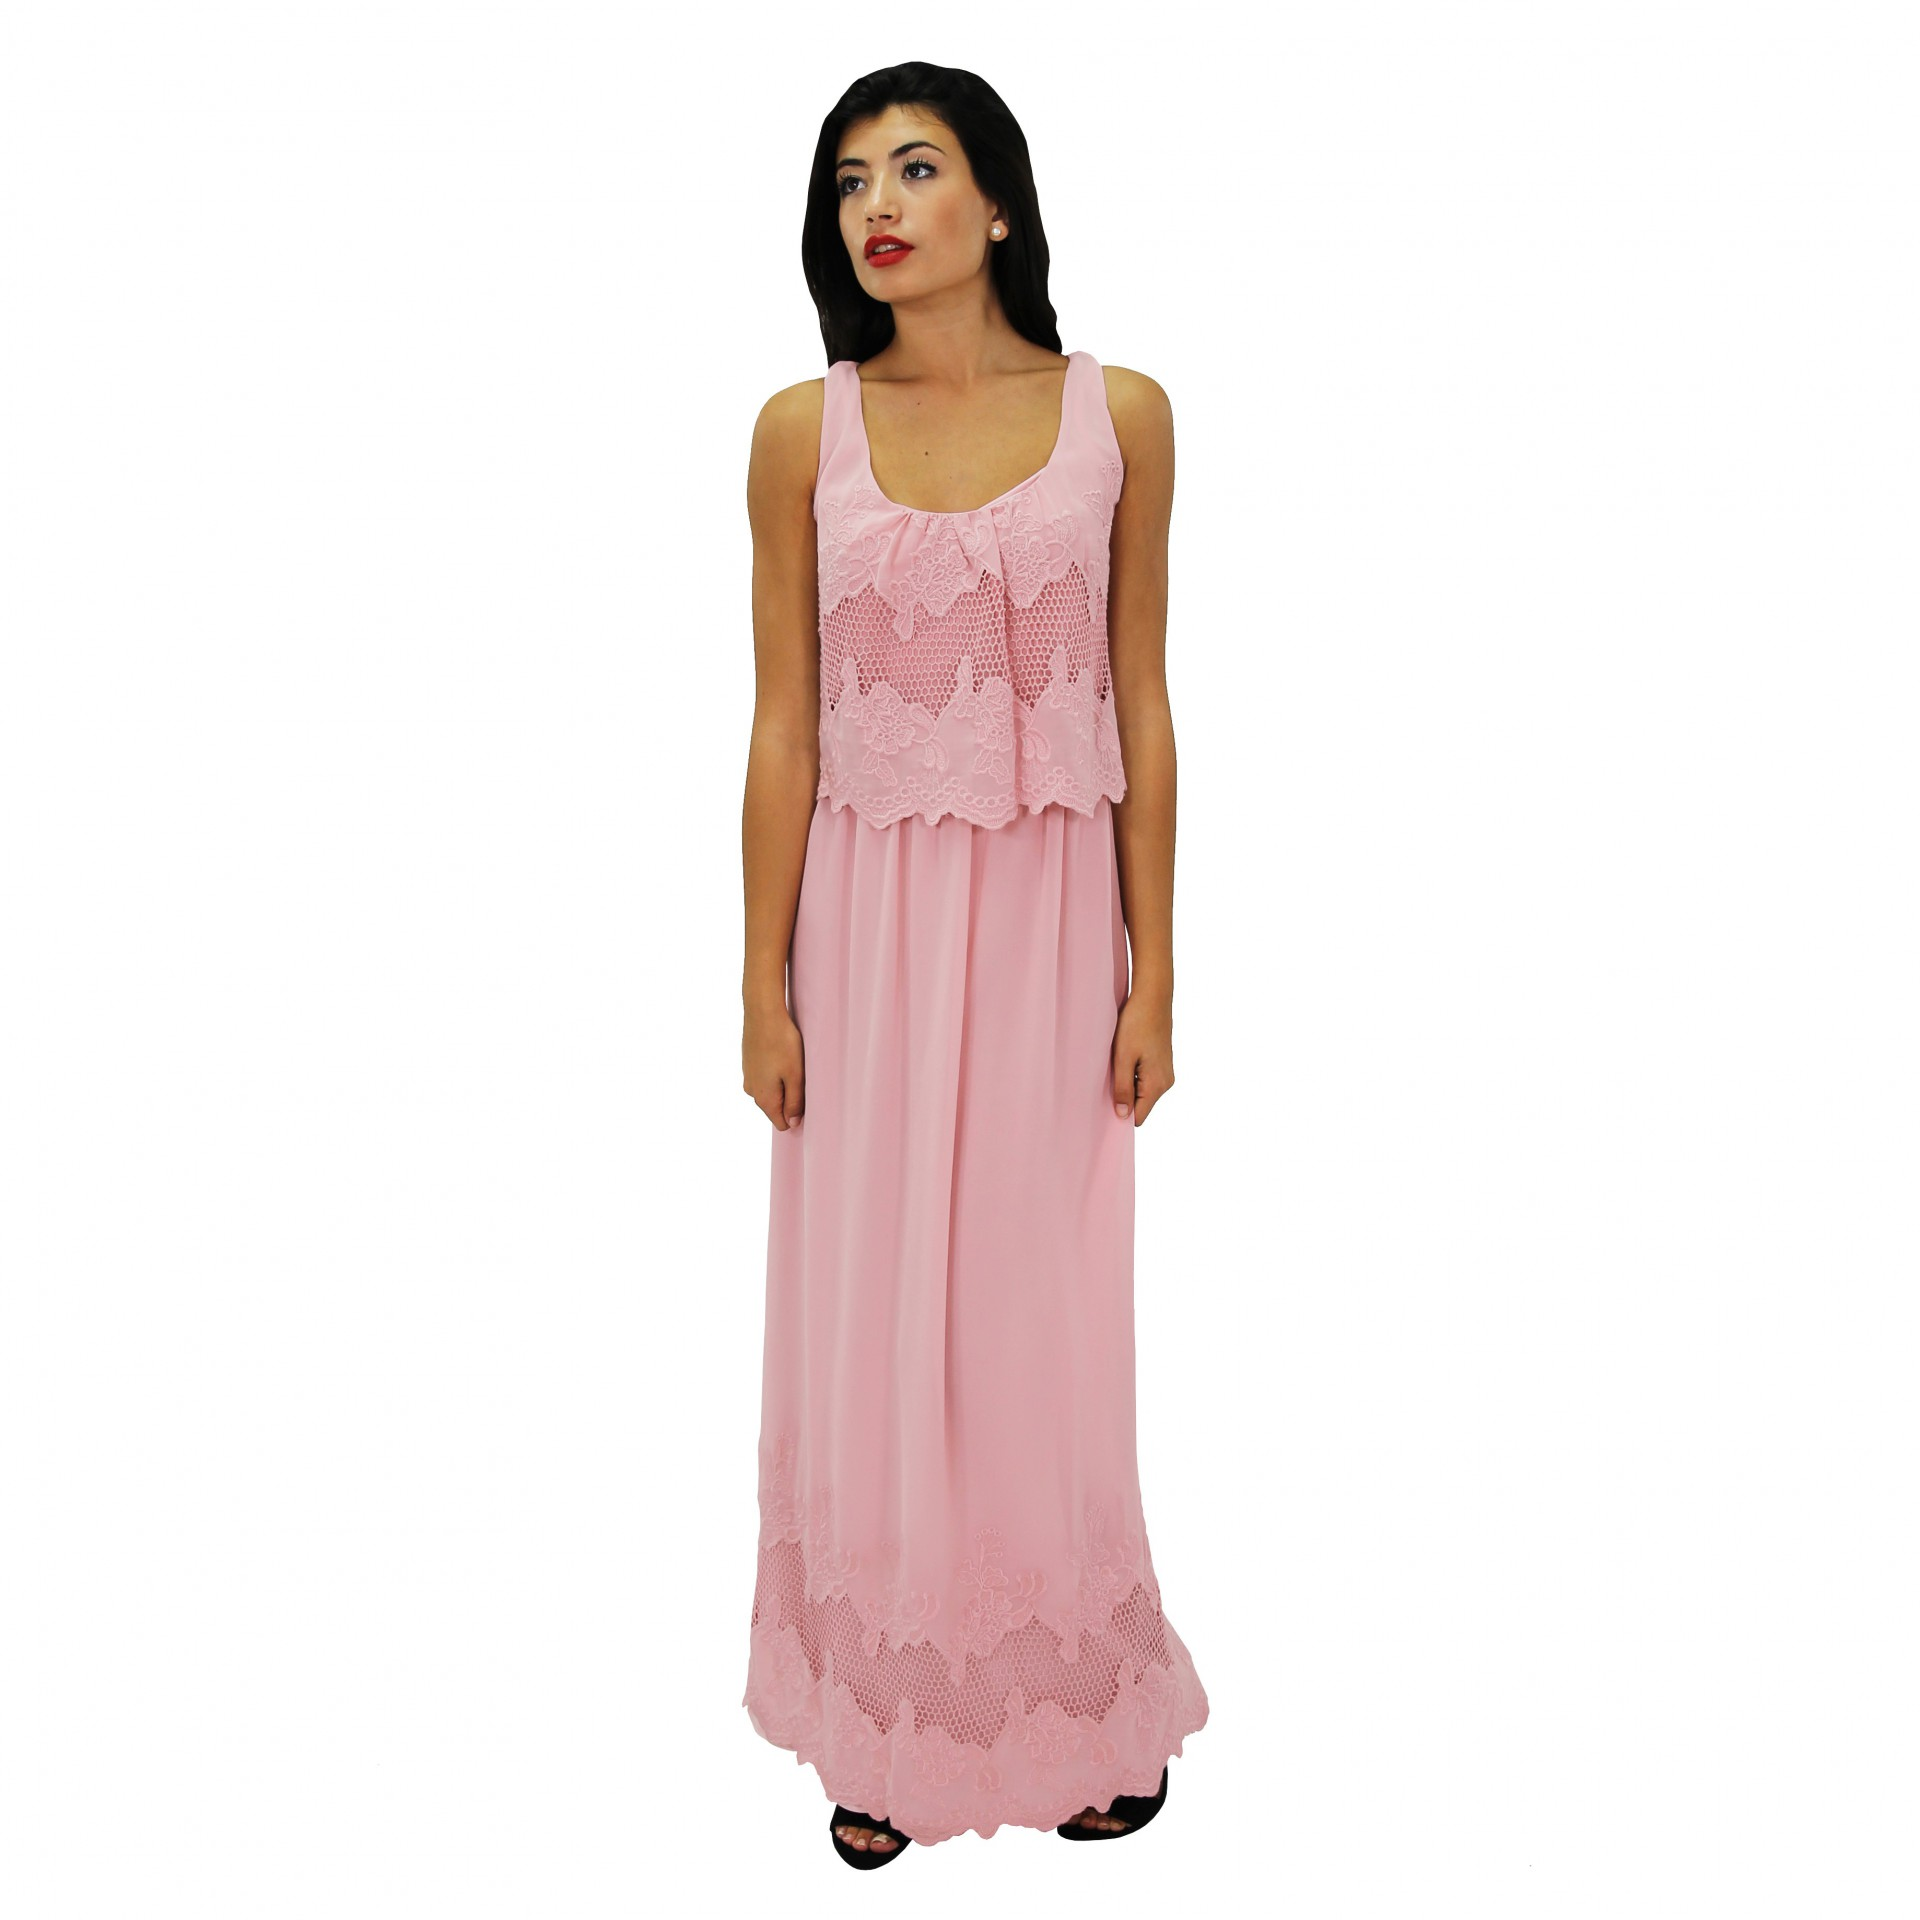 Vestido largo bordado rosa -50% BLUMARINE